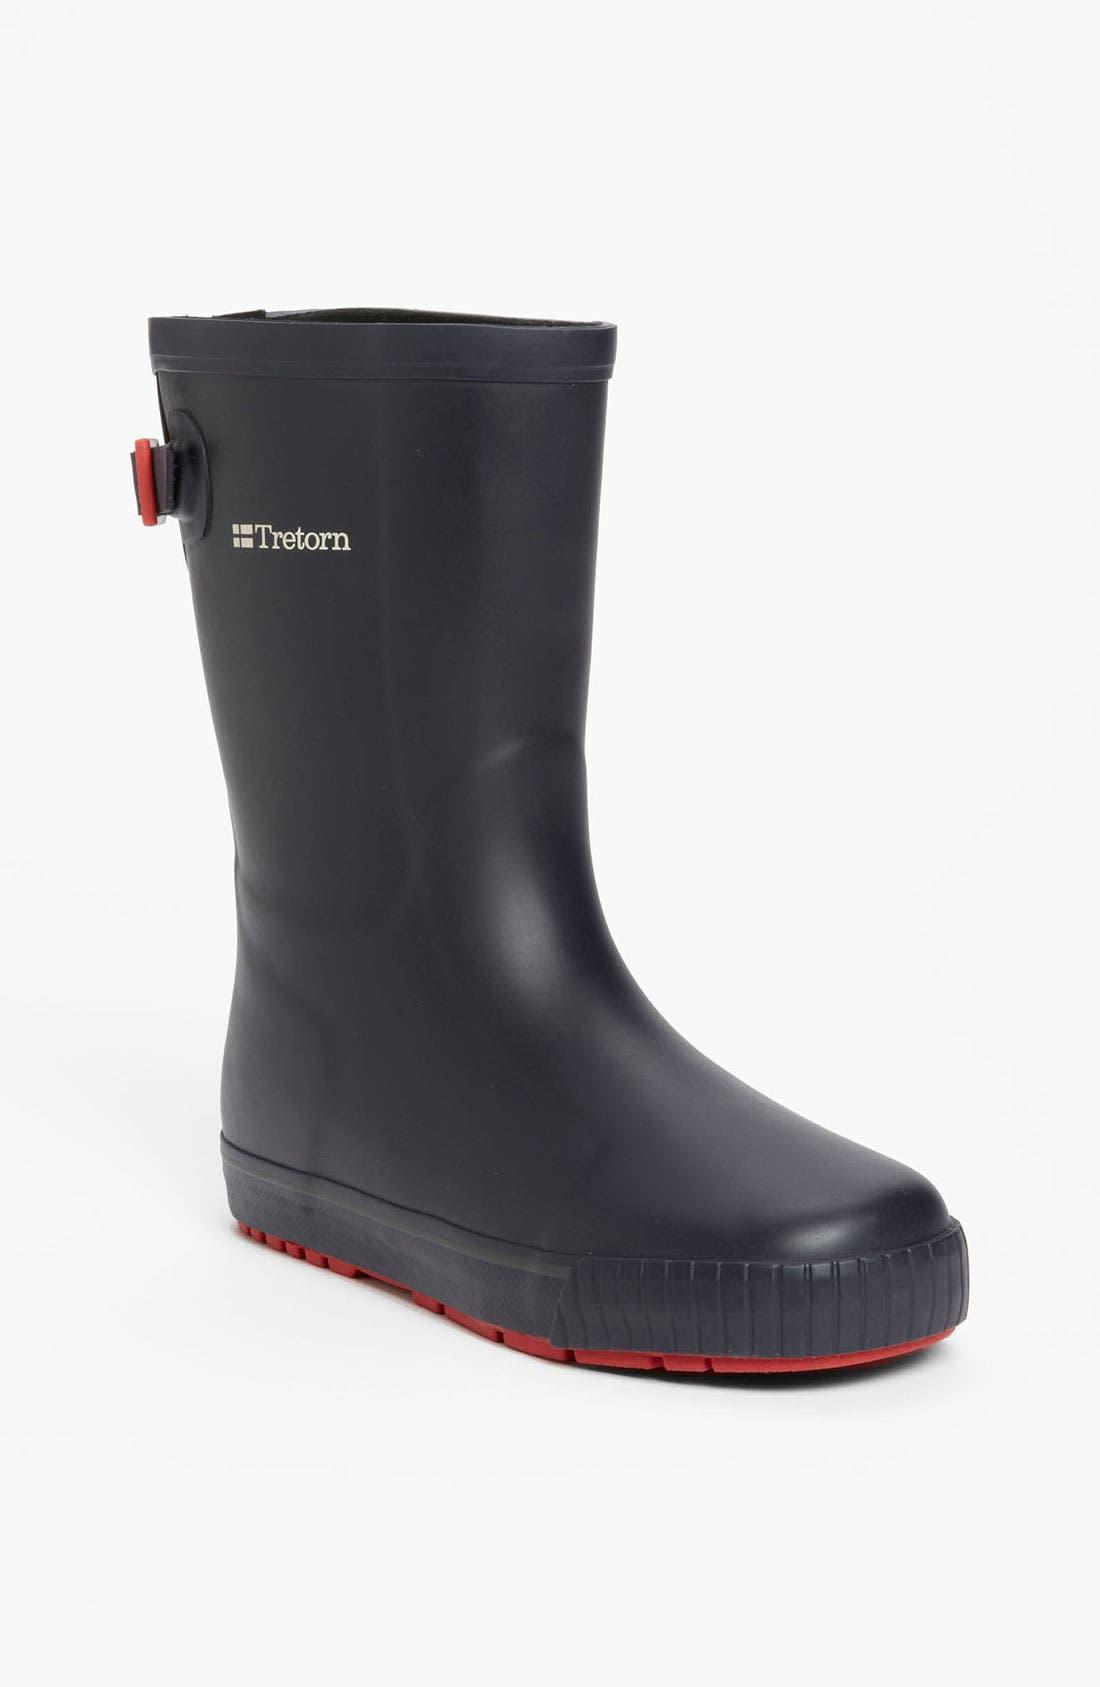 Main Image - Tretorn 'Skerry Straple' Rain Boot (Women)